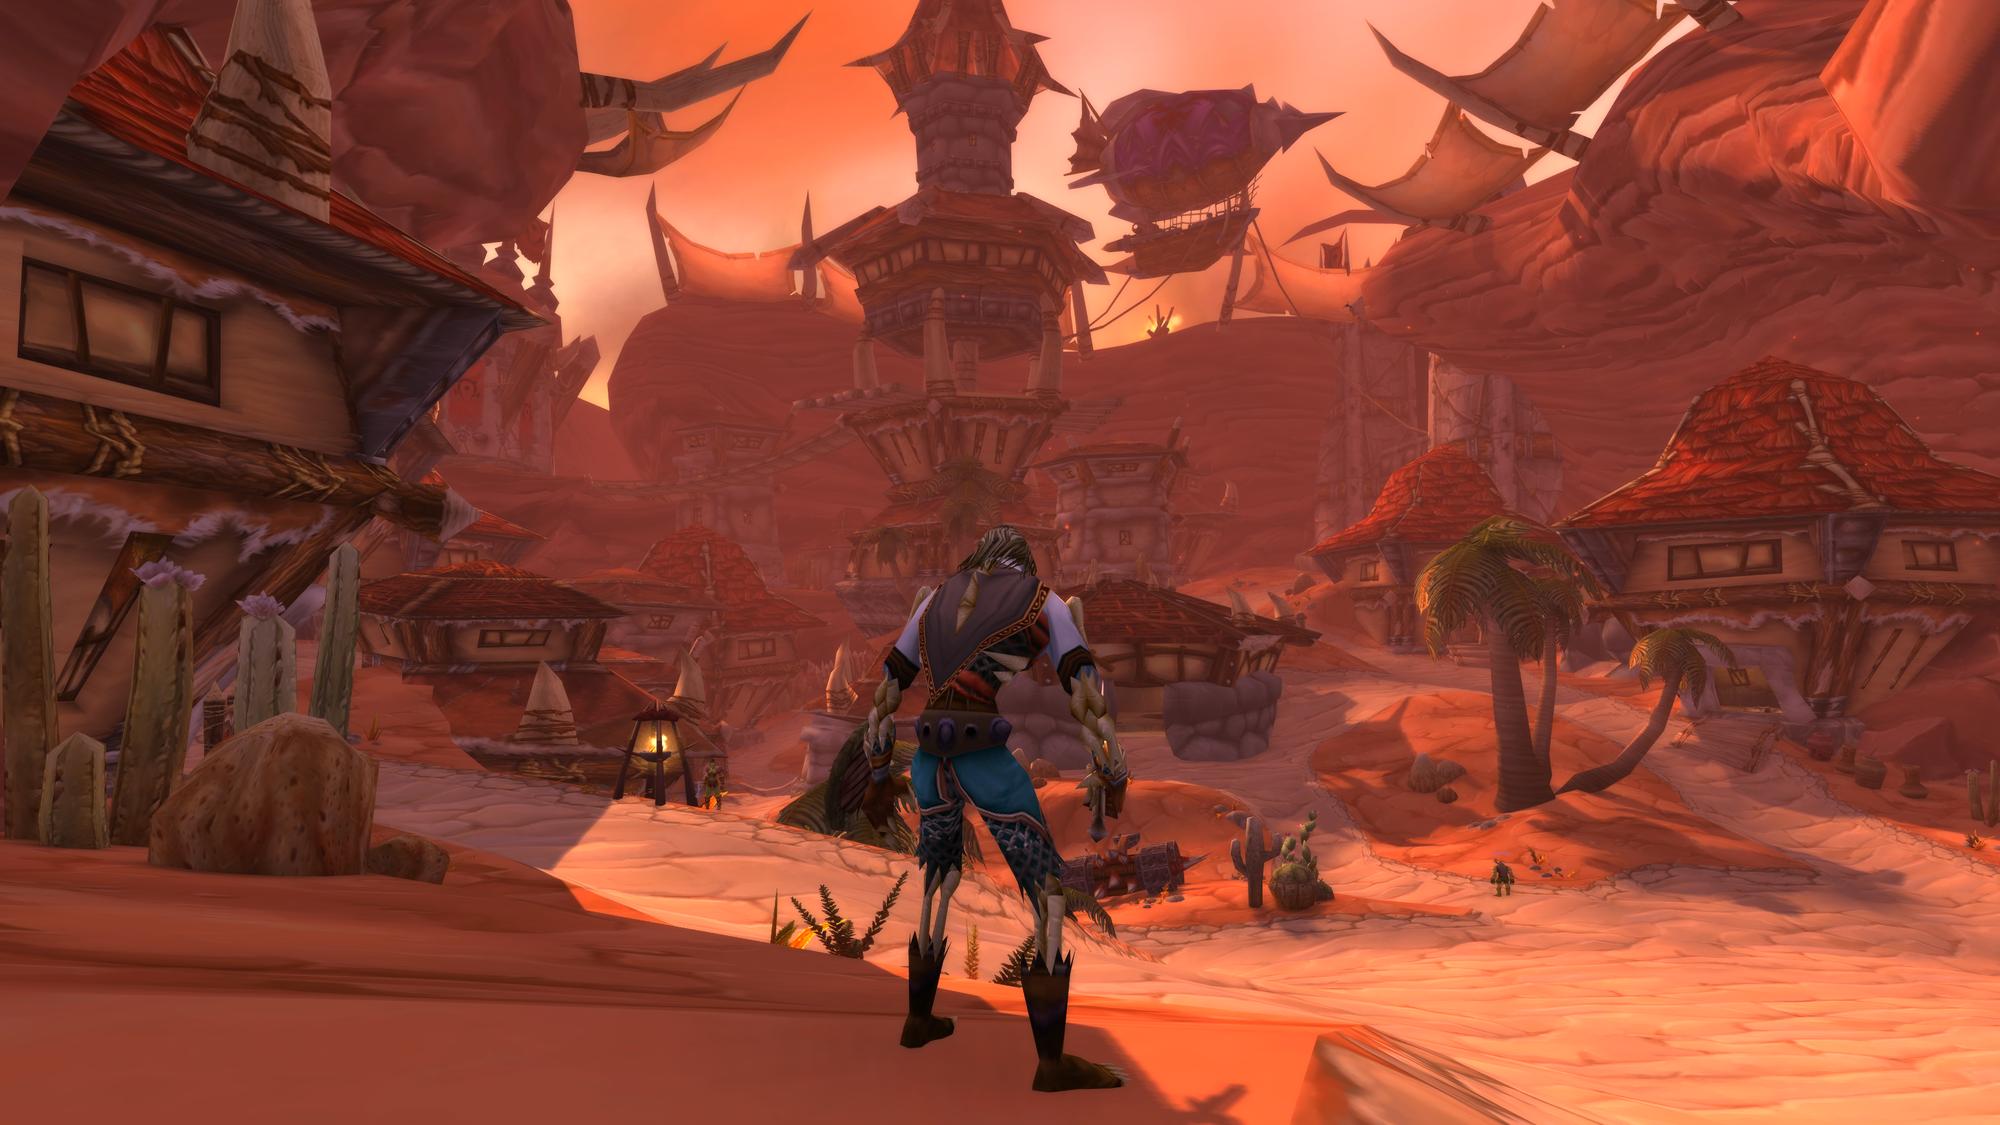 World Of Warcraft Screenshot 2019.05.23 - 18.51.05.52.png